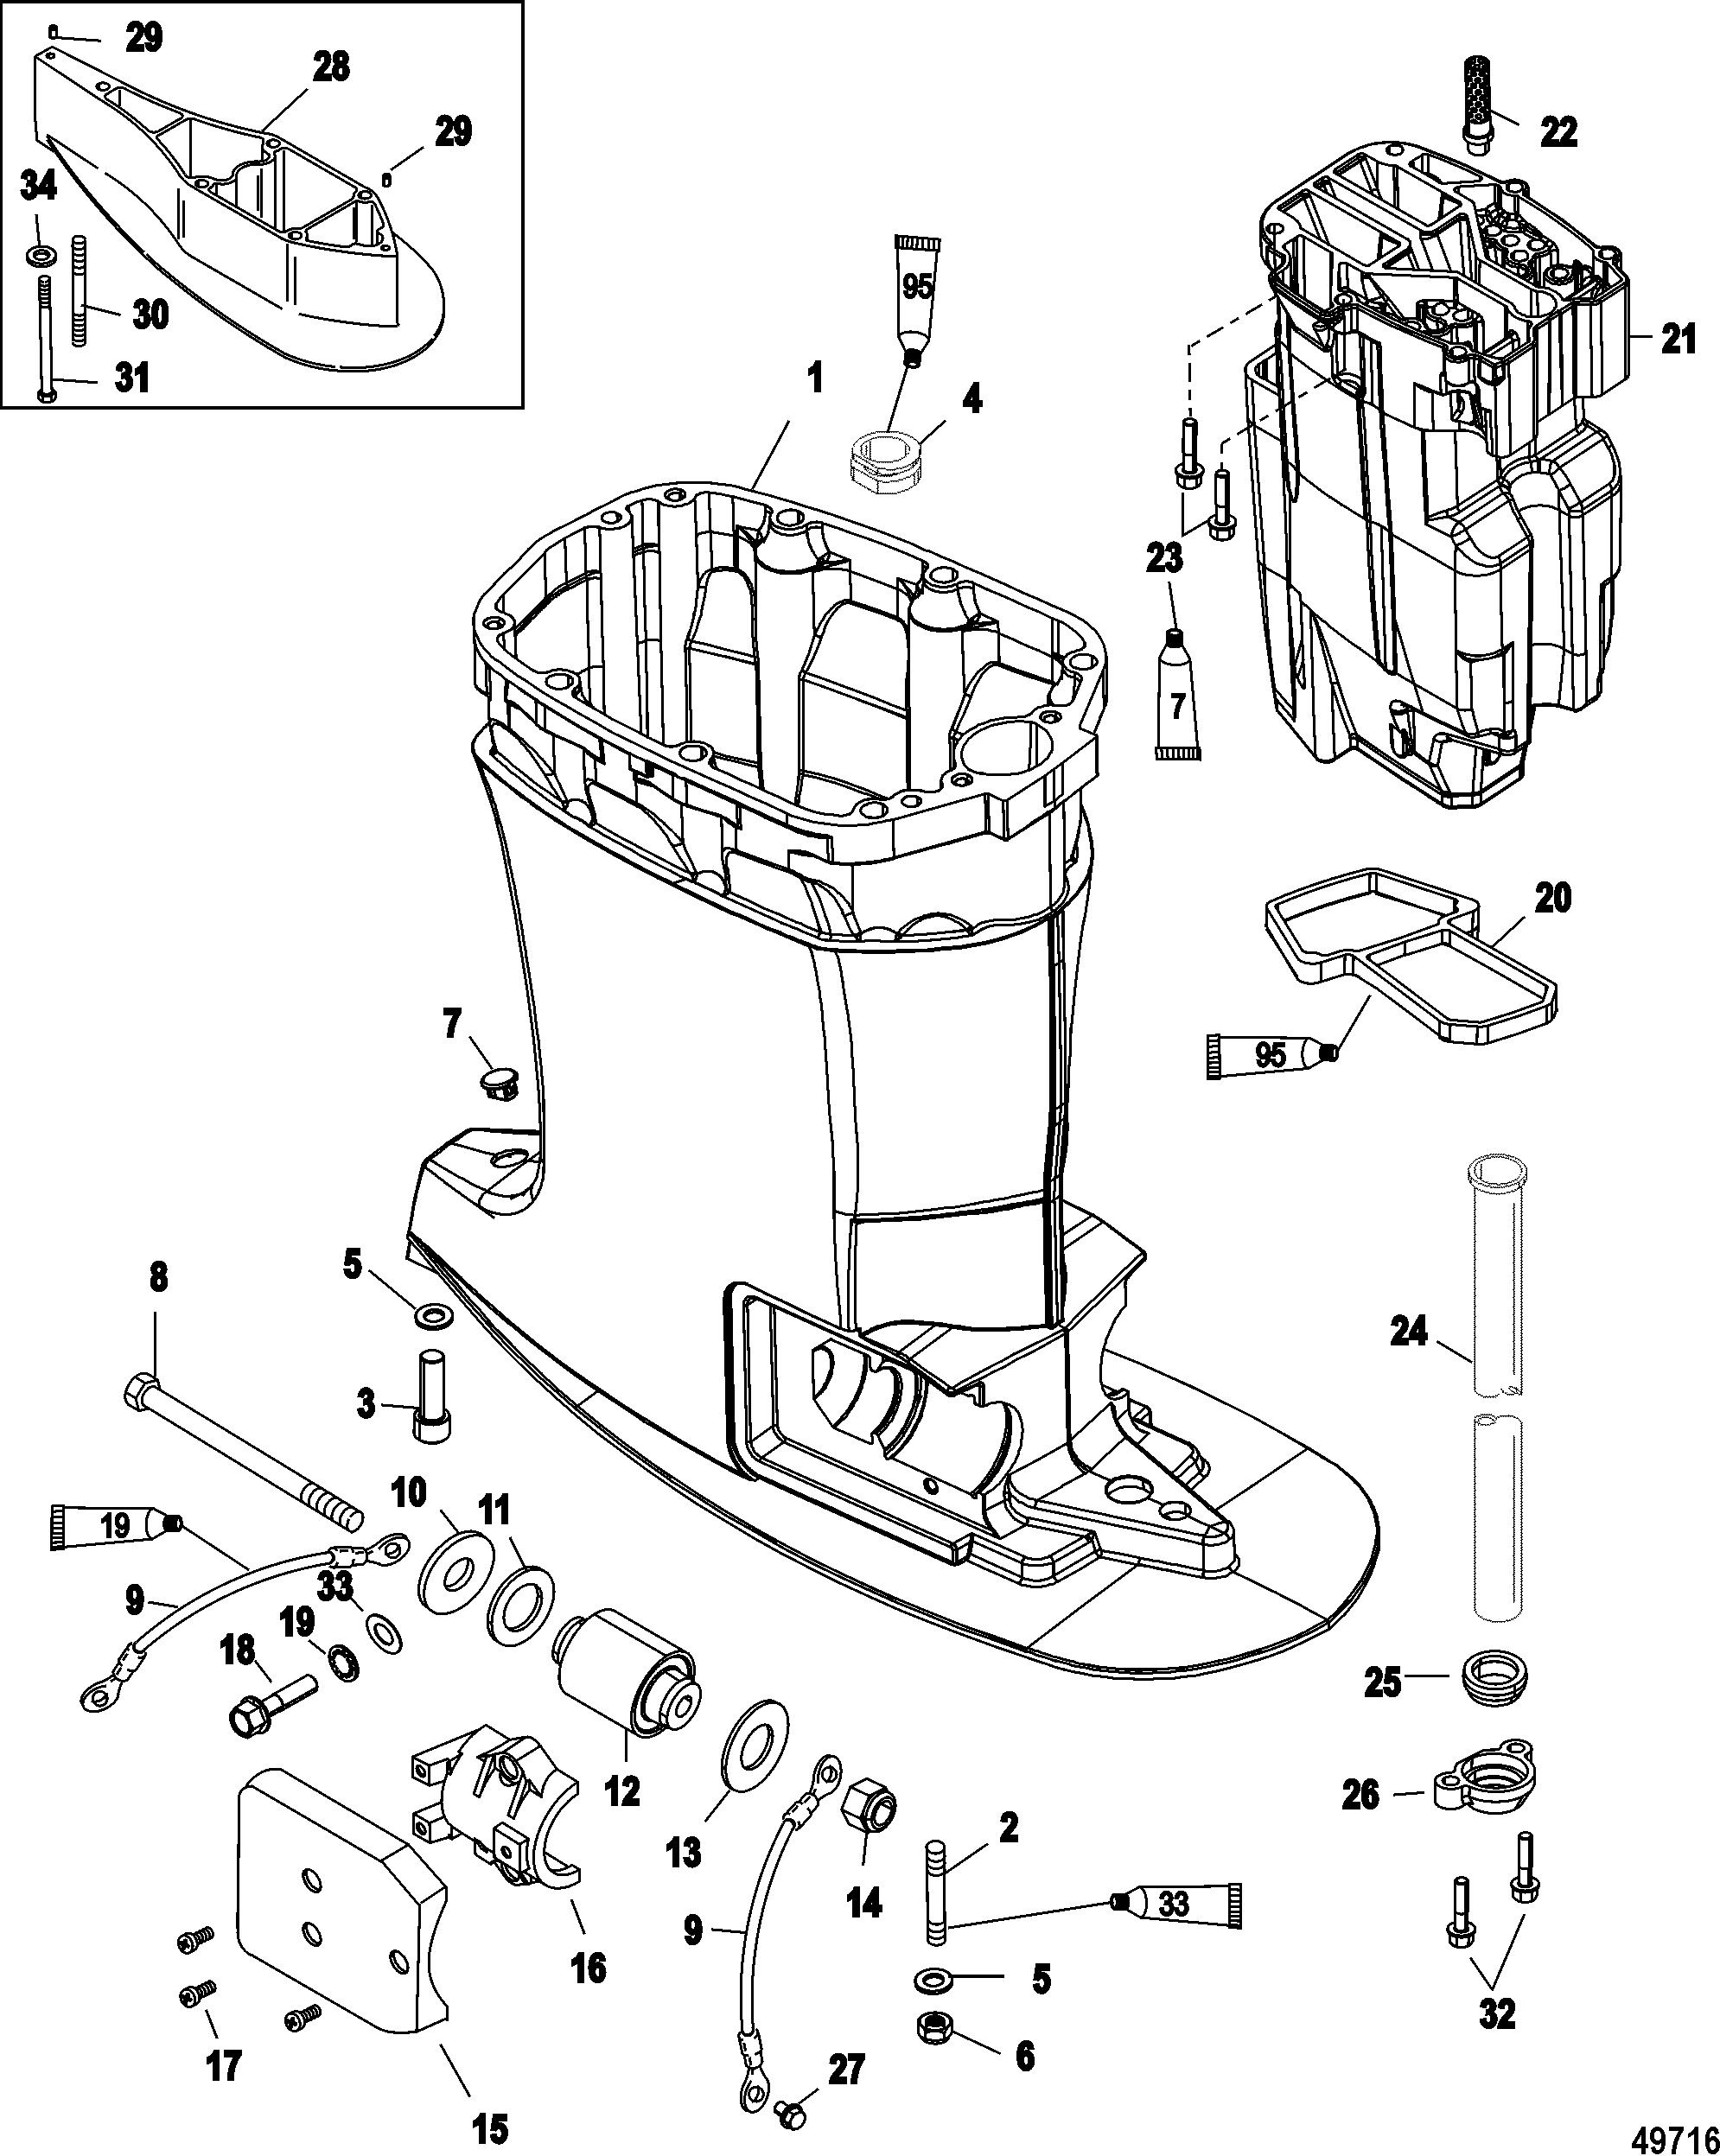 driveshaft housing and exhaust for mercury 200 optimax v6 dfi